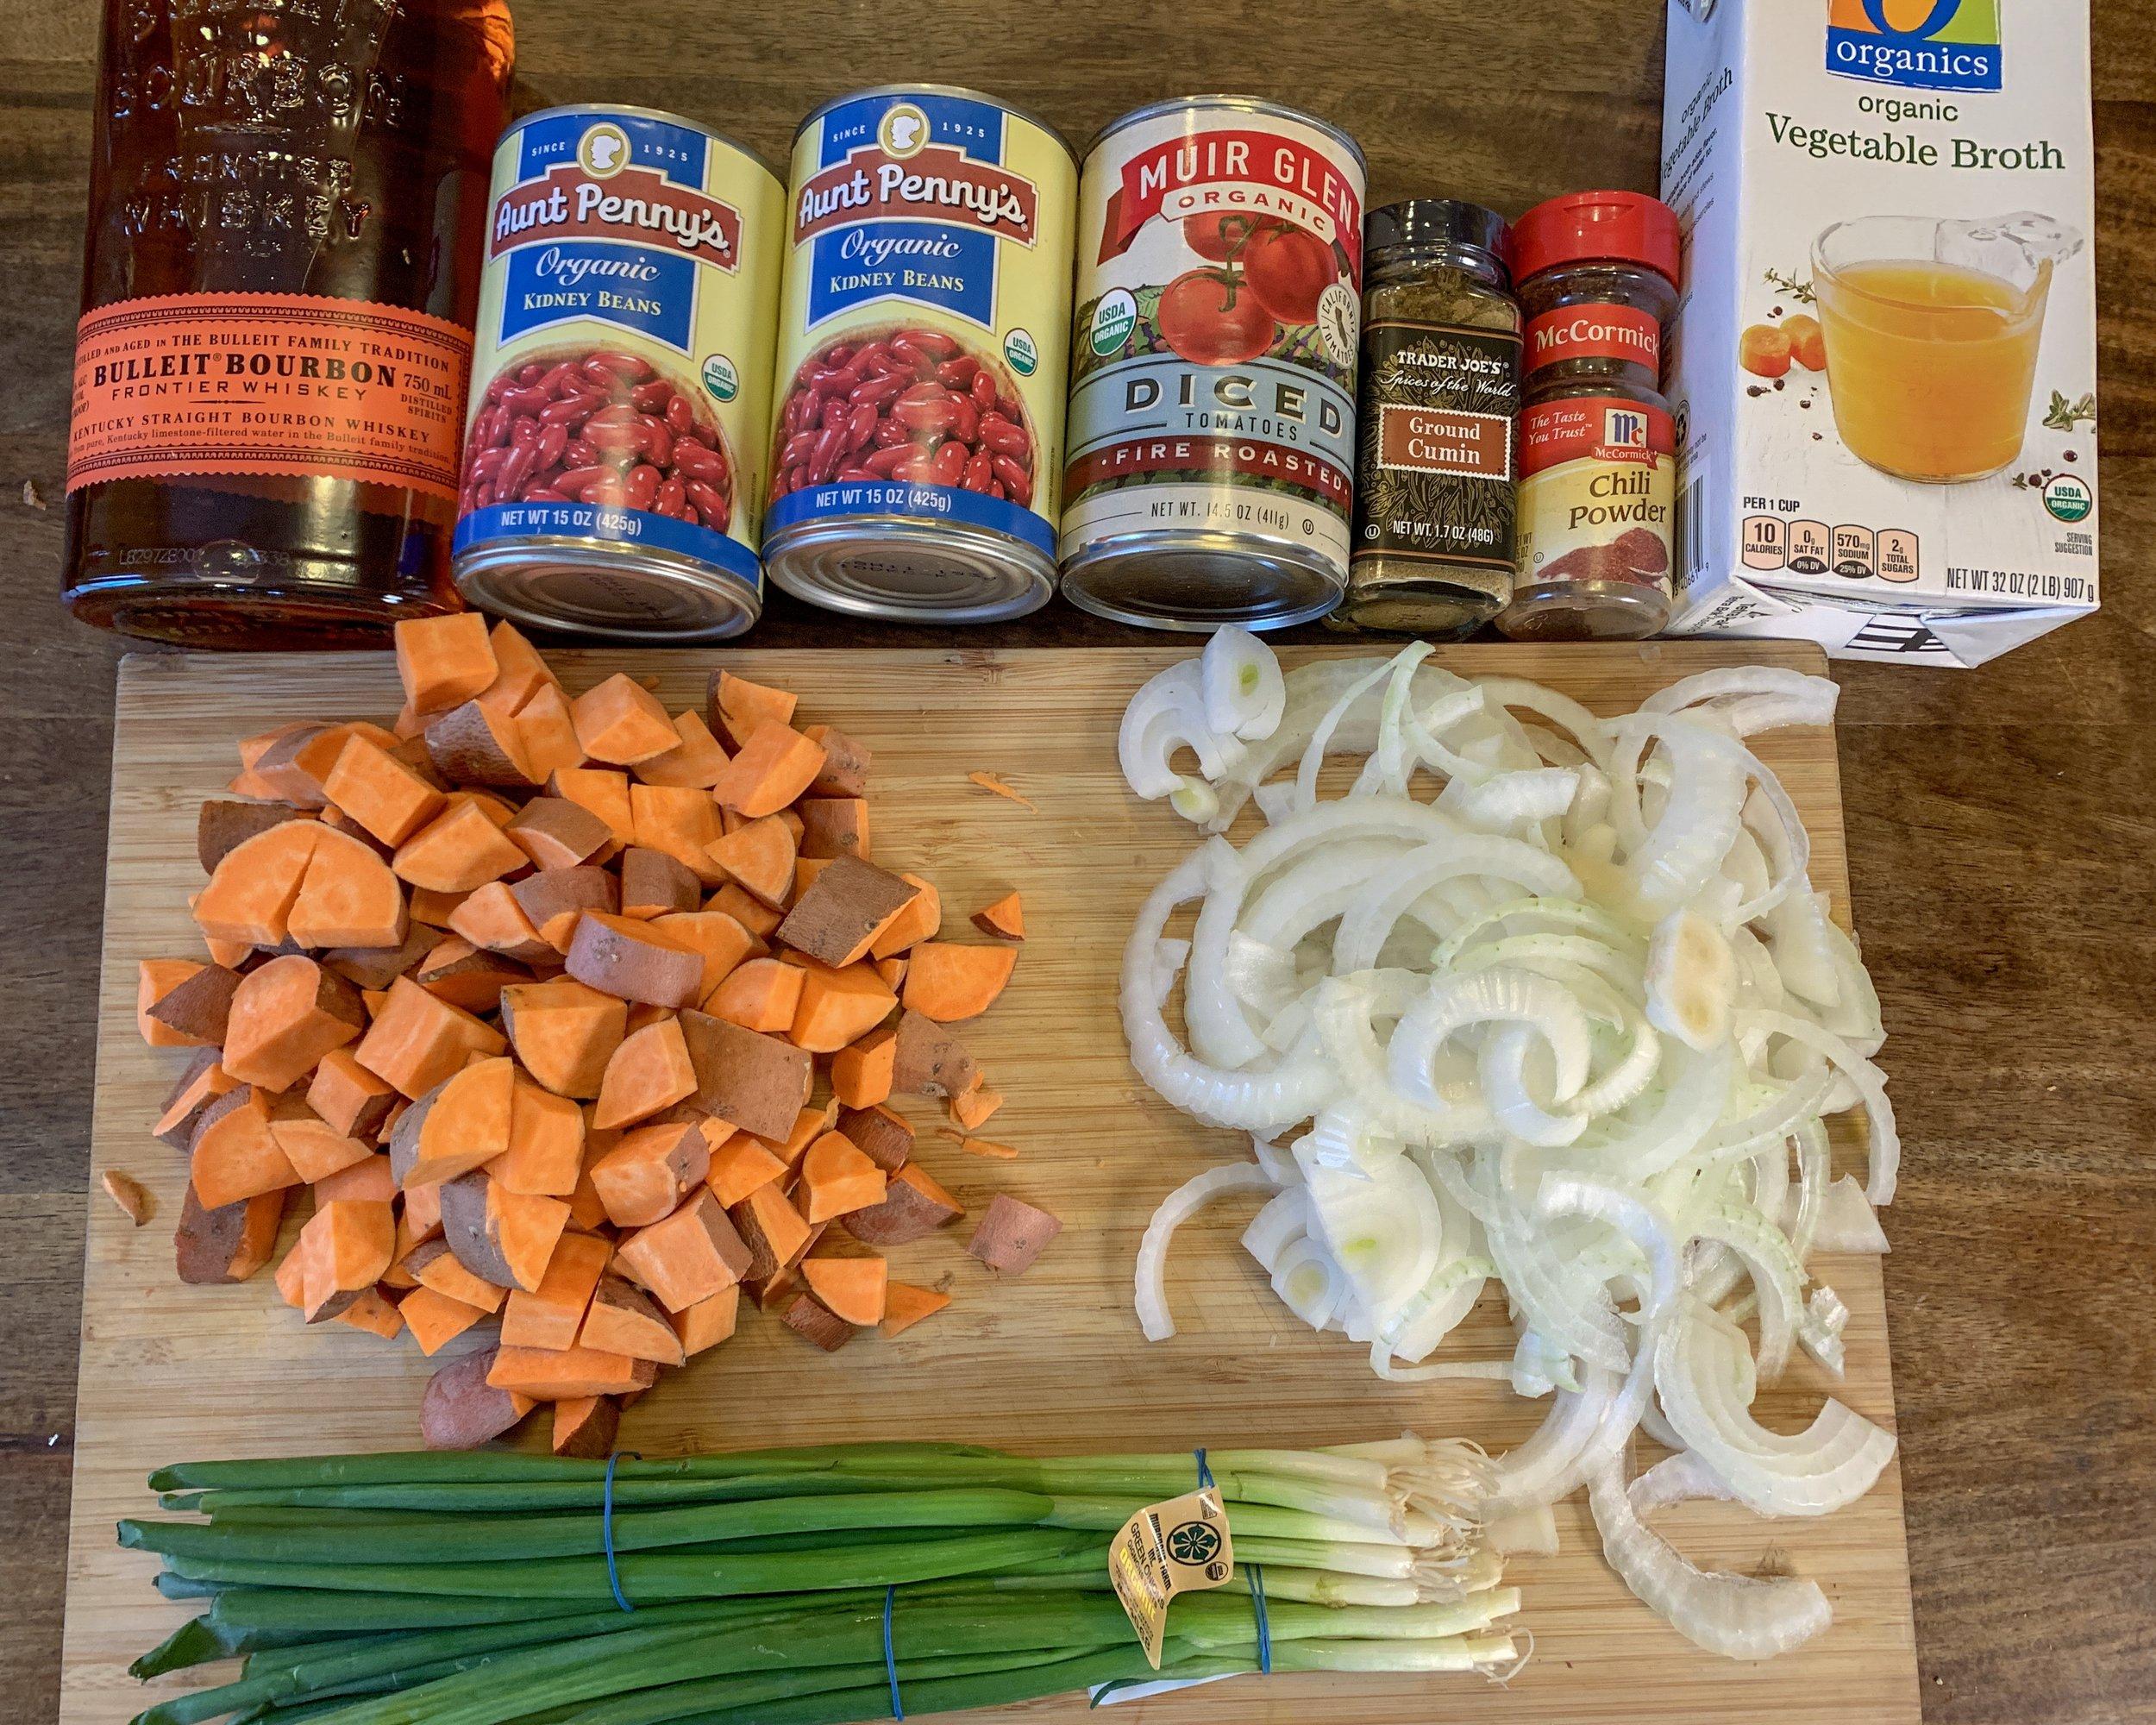 ingredients for vegan gluten free chili